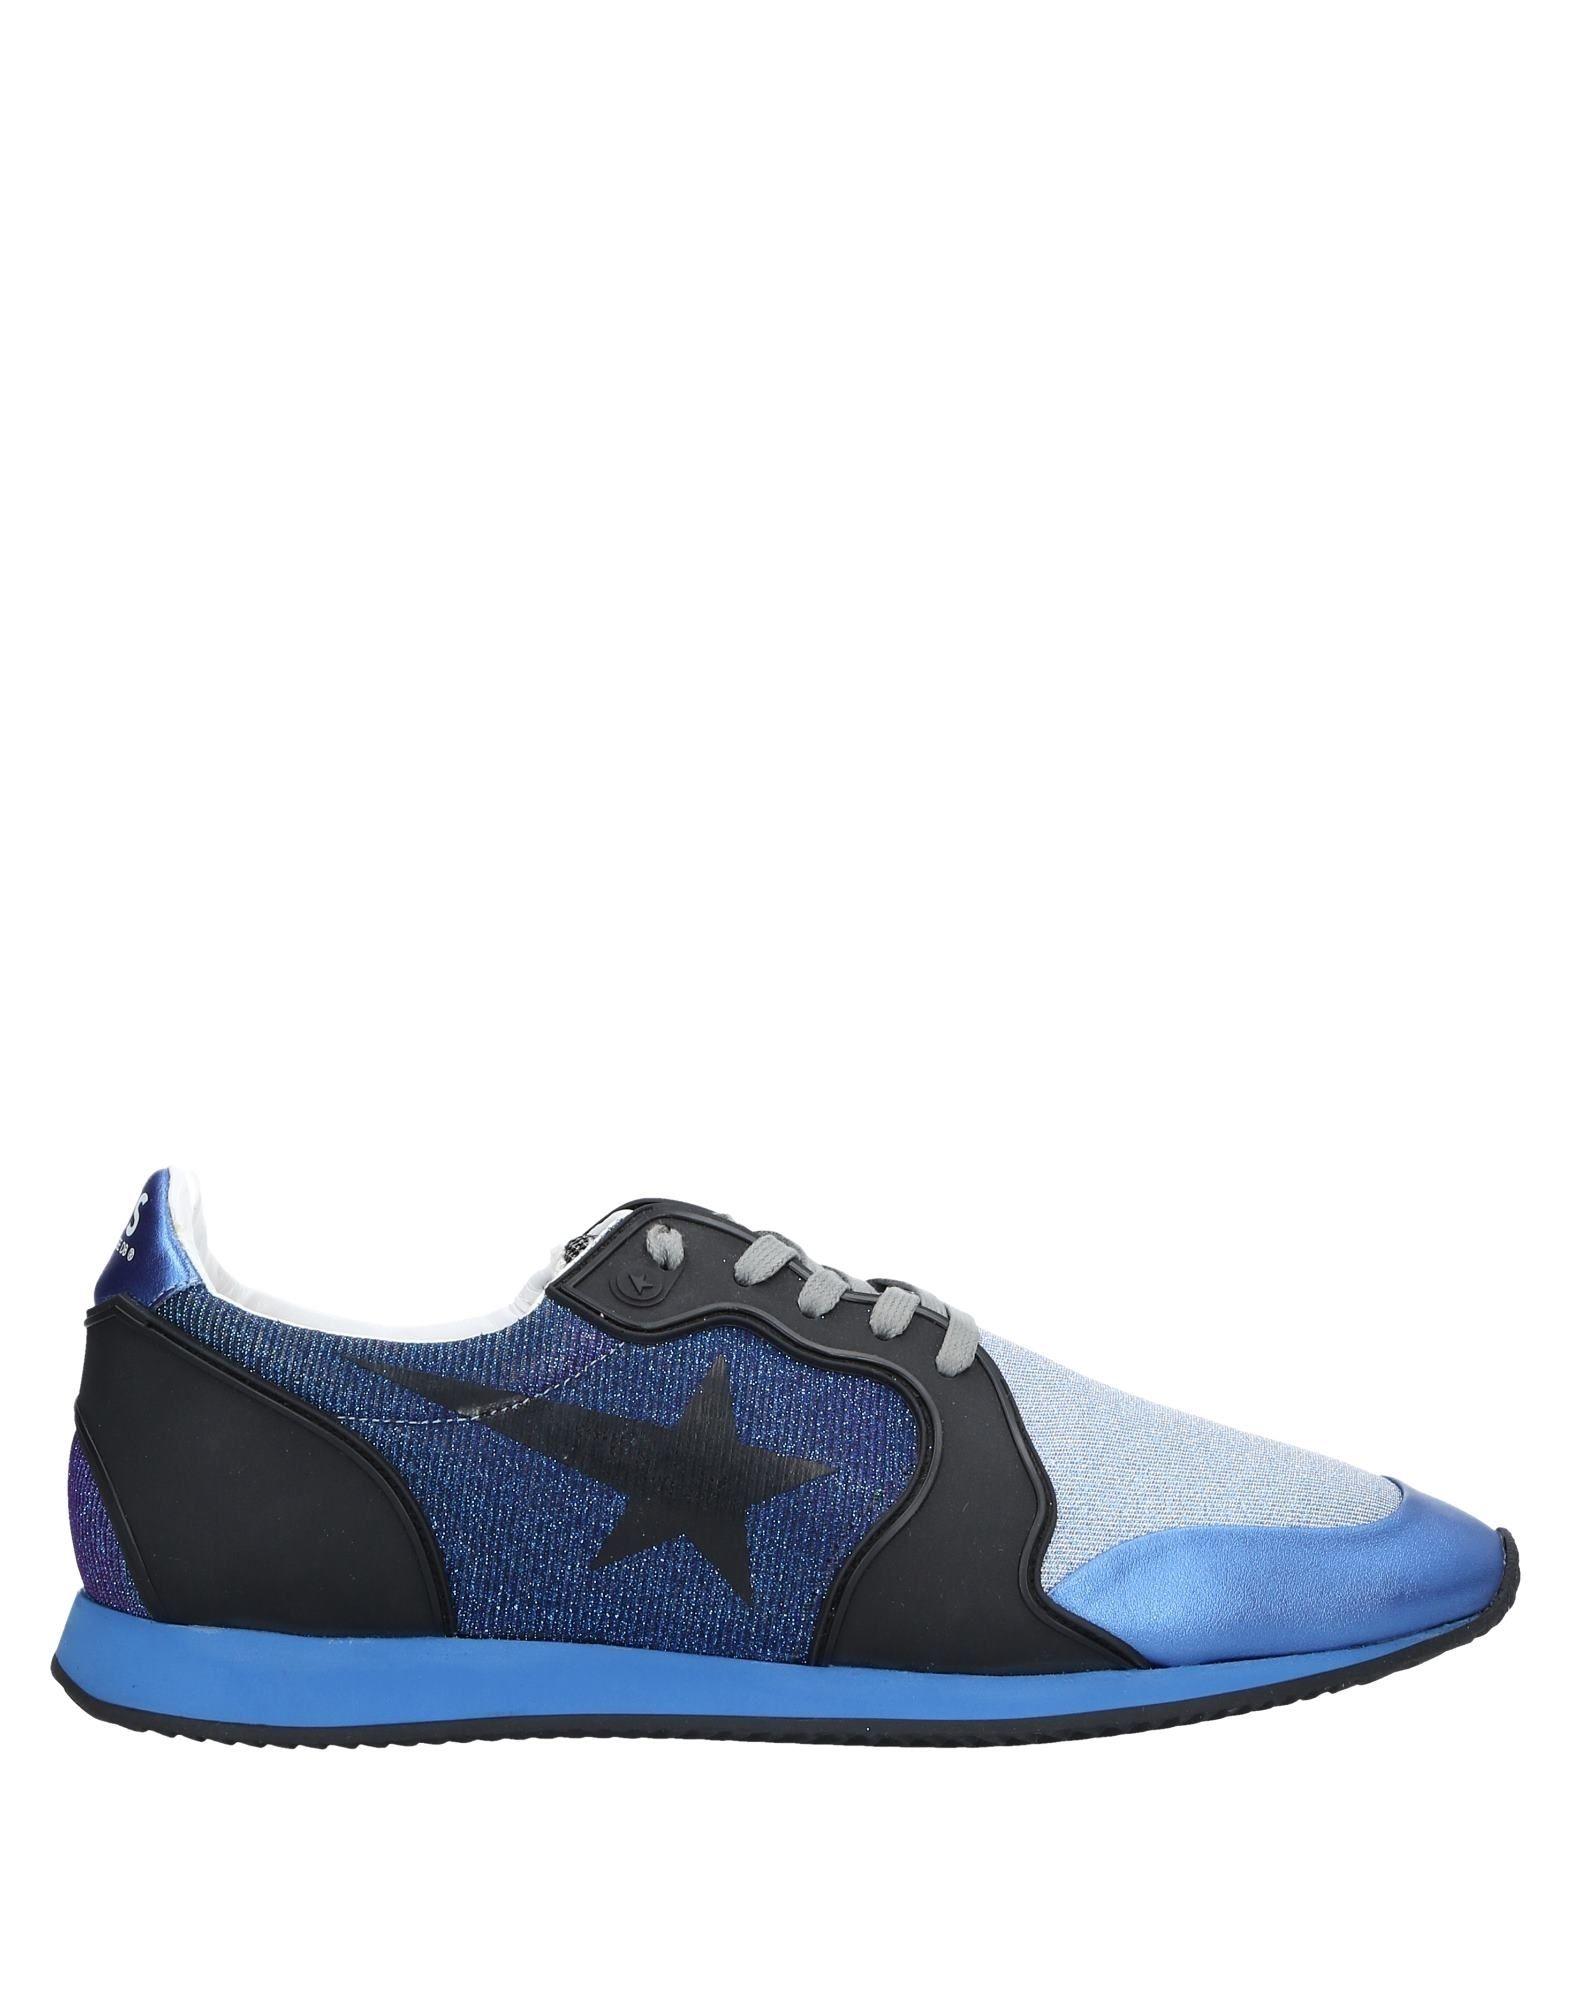 Sneakers Haus Golden Goose Donna - 11541387DS